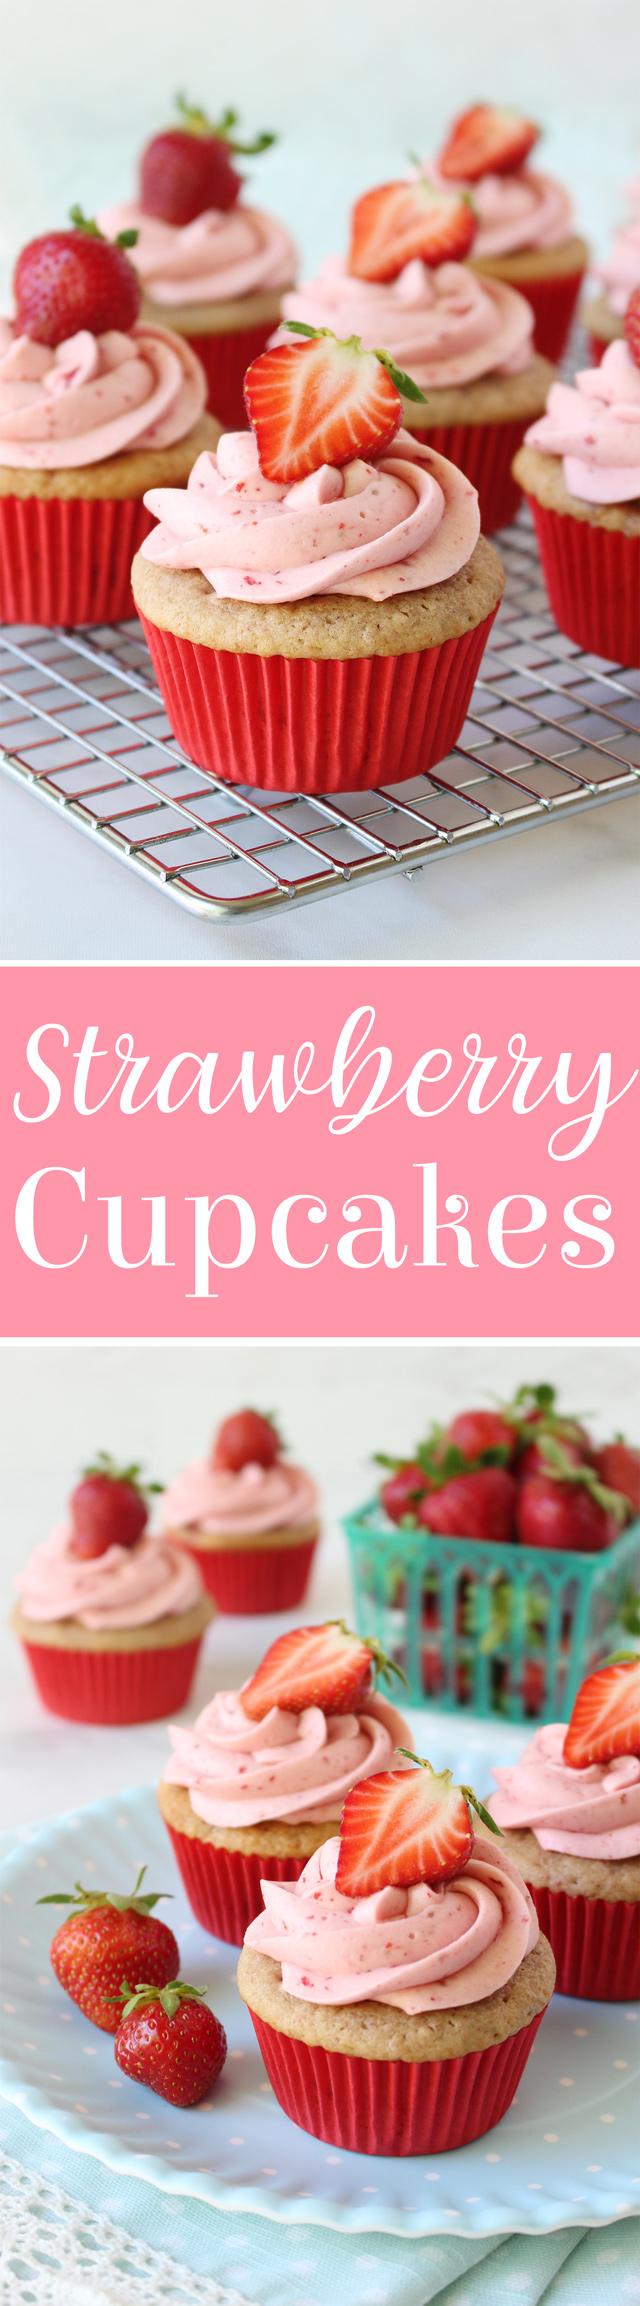 Best Strawberry Cupcakes